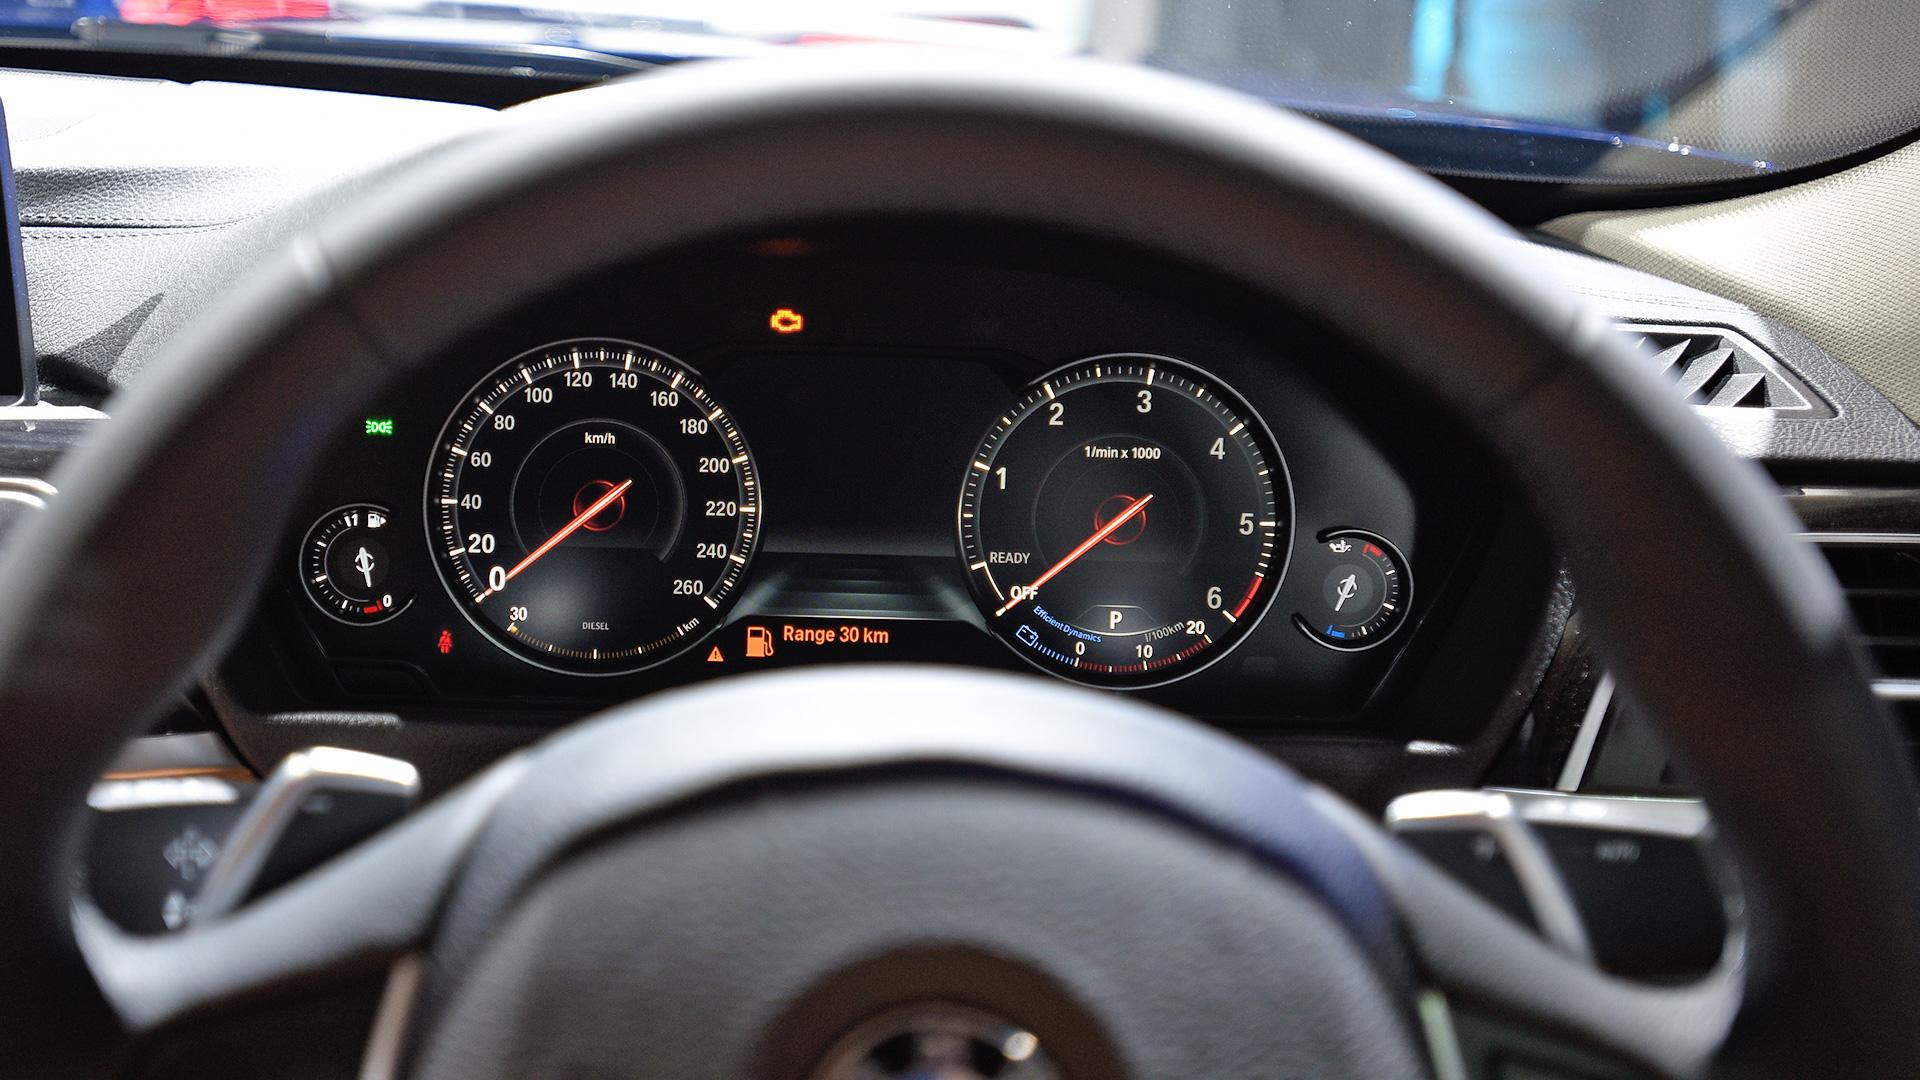 Bmw M3 Sedan 2018 Std Interior Car Photos Overdrive